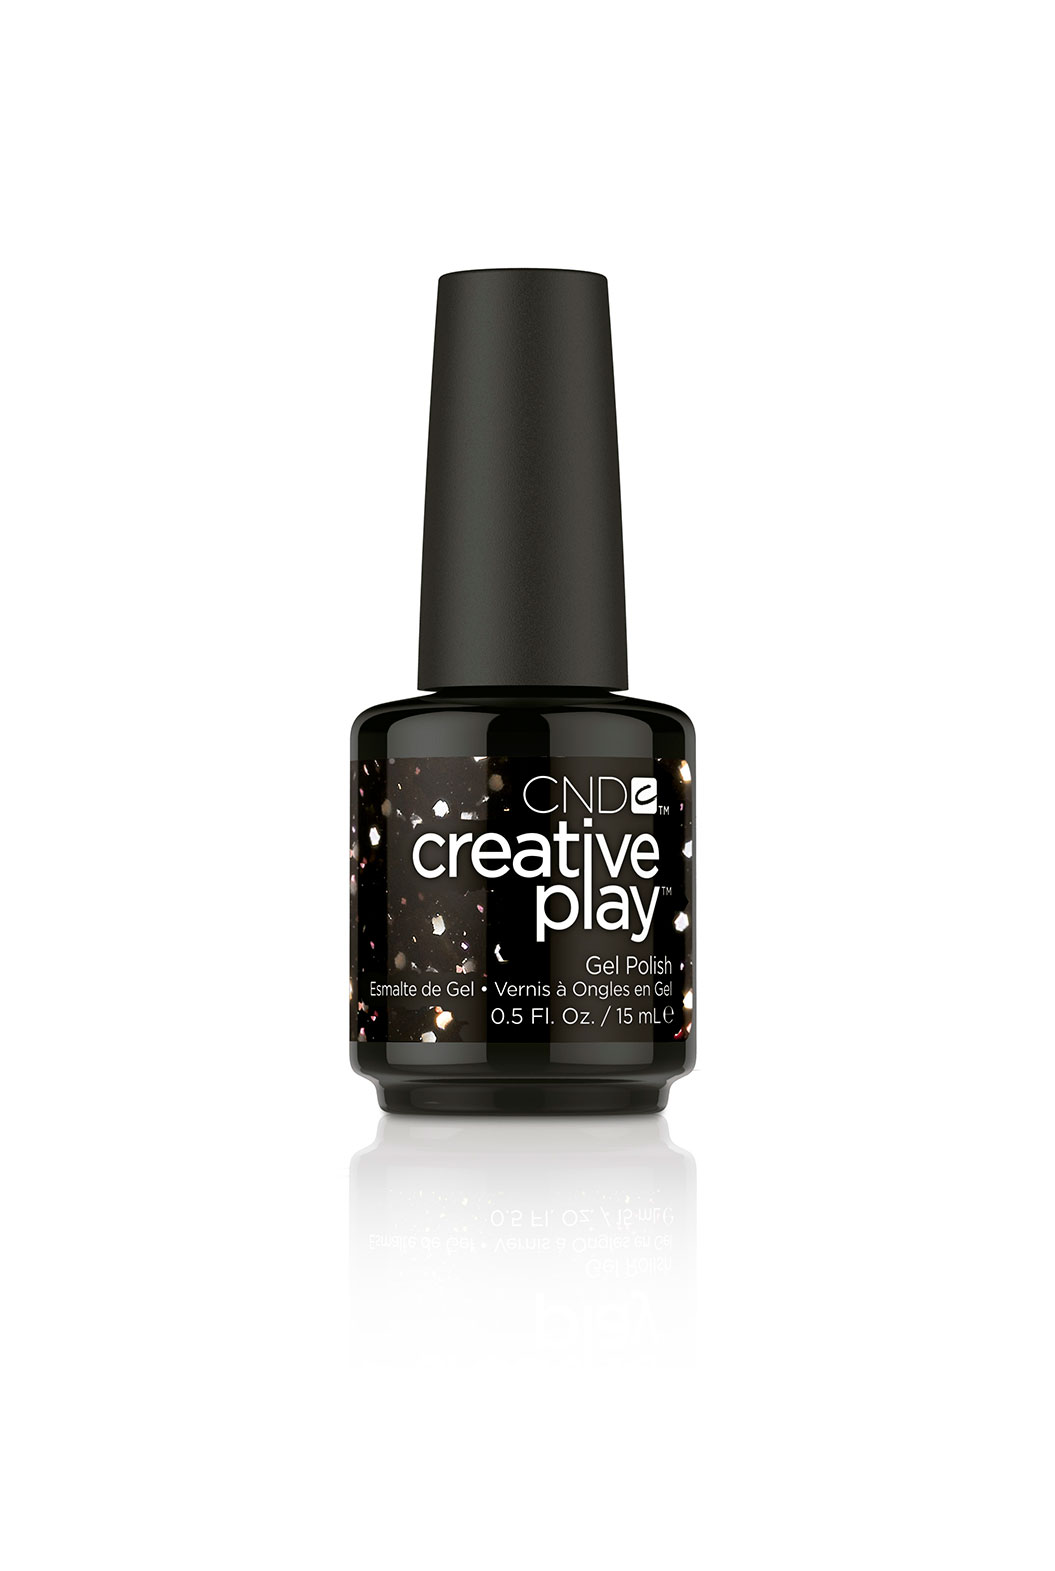 CND 450 гель-лак для ногтей Nocturne It Up / Creative Play Gel, 15 мл